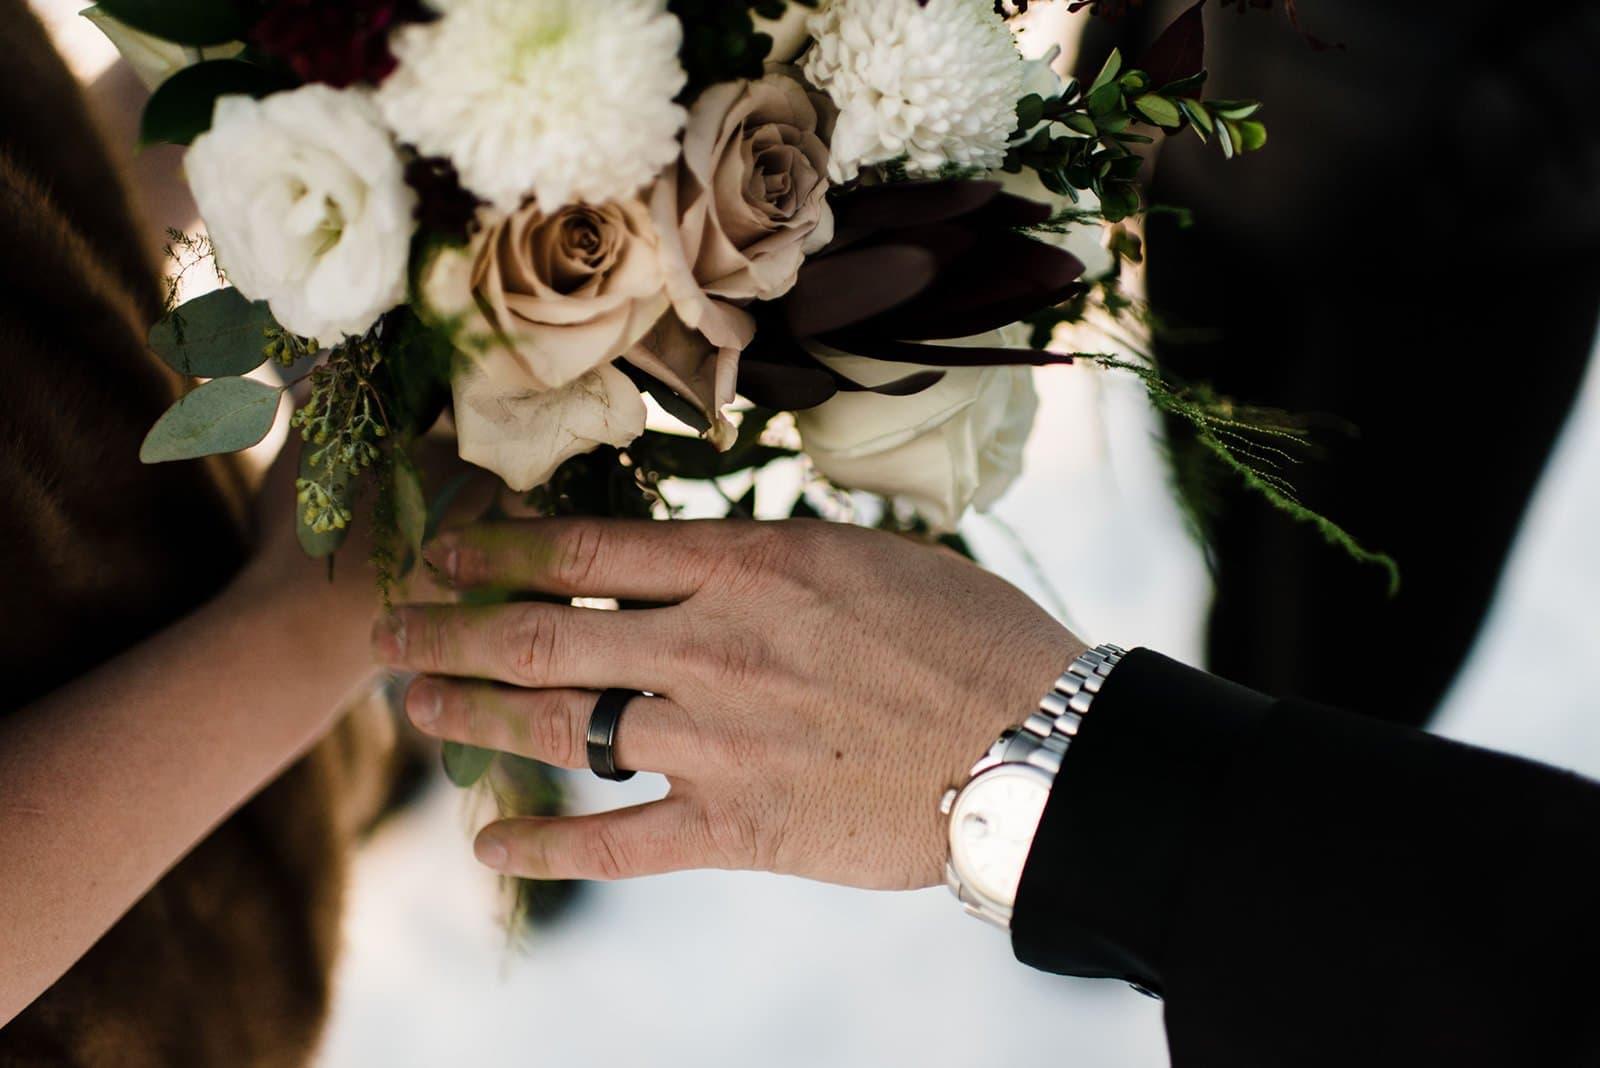 wedding detail shots of rings